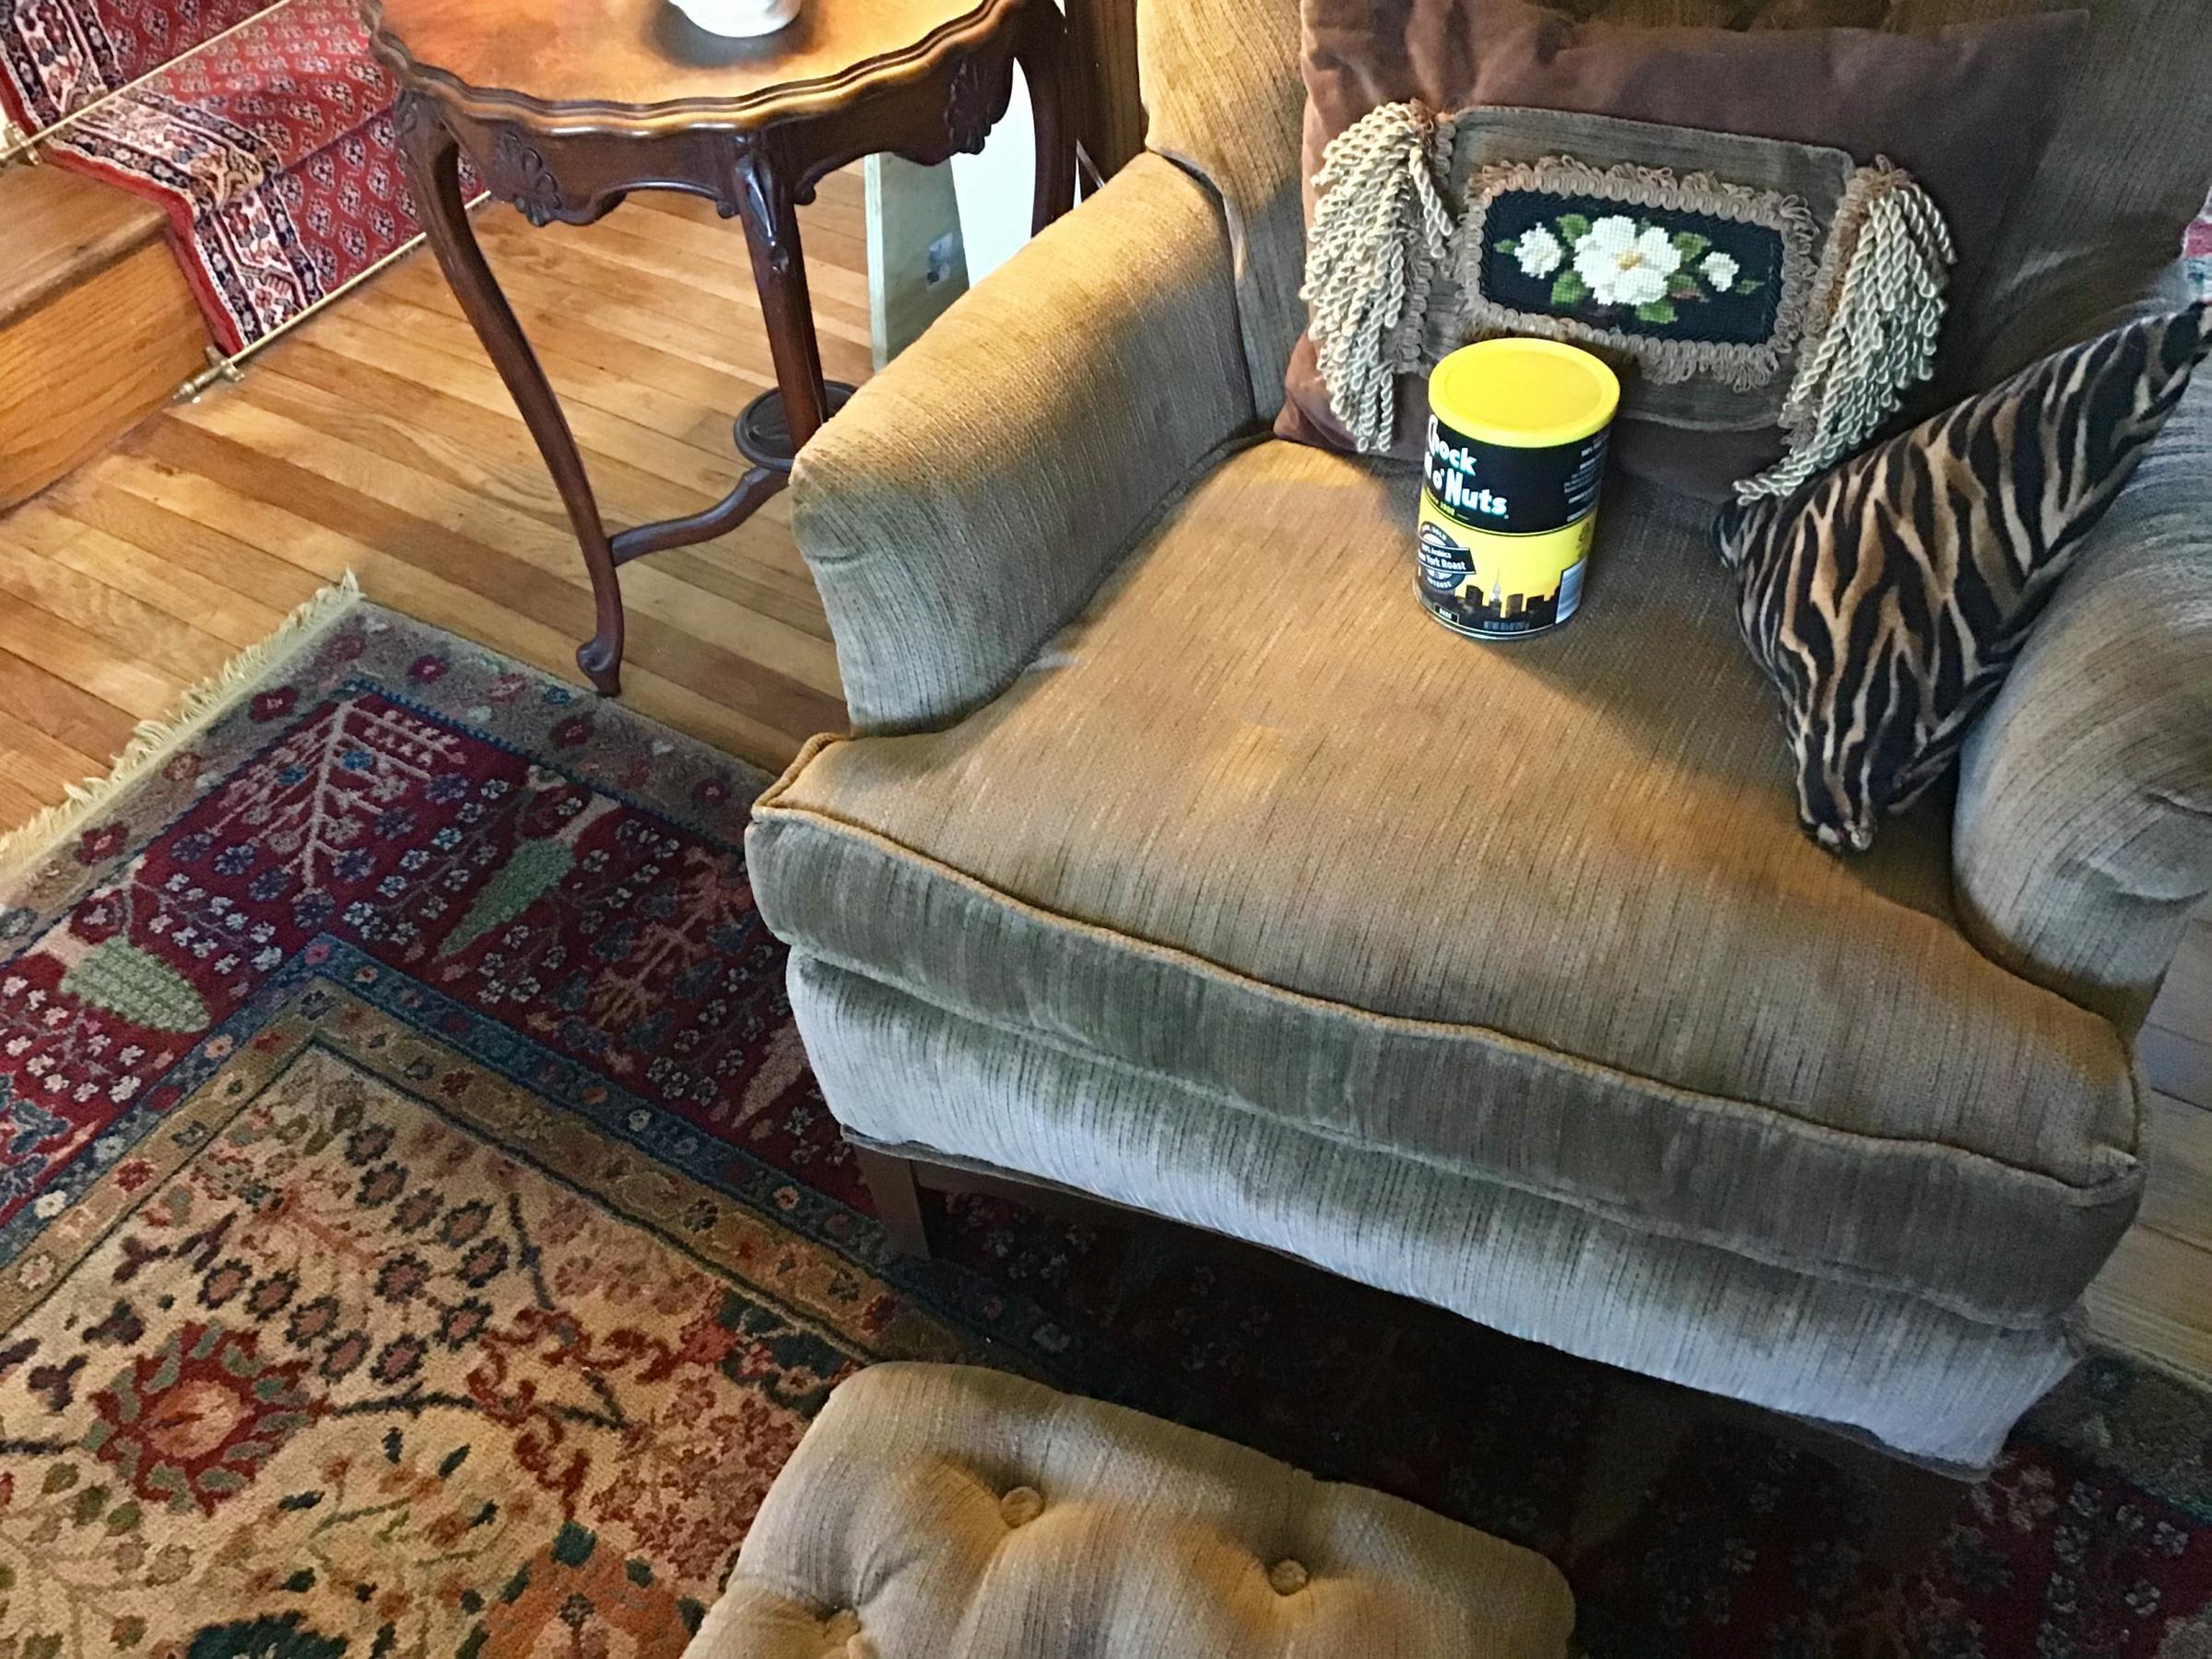 Keeping Dogs off furniture.-653183e8-500d-4aaf-938d-9049f6ffc9a0.jpg